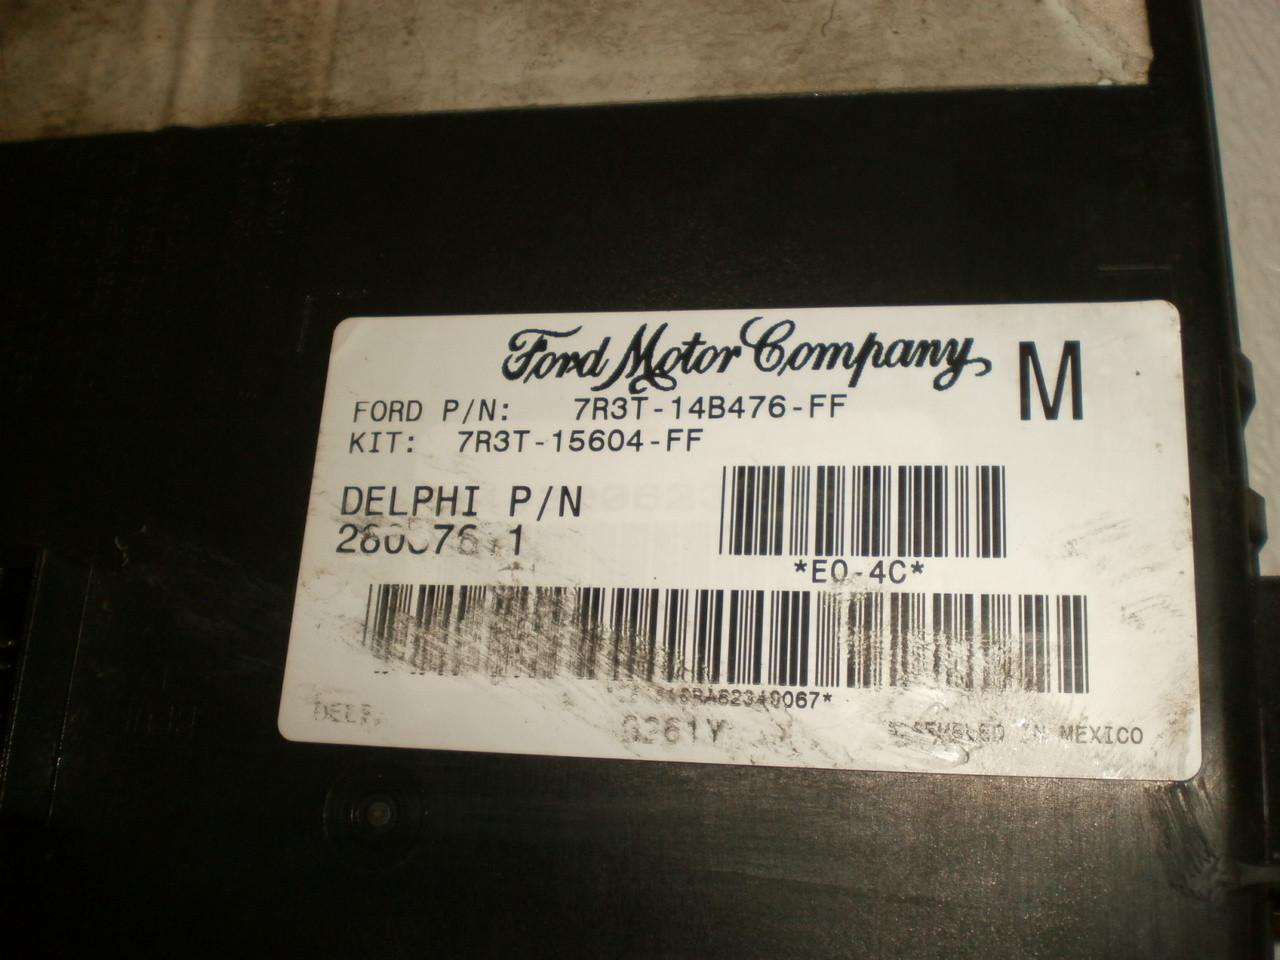 2005-2009 Ford Mustang Body Control Module Multifunction GEM Computer Brain  7R3T-14B476-FF 7R3T-15604-FF